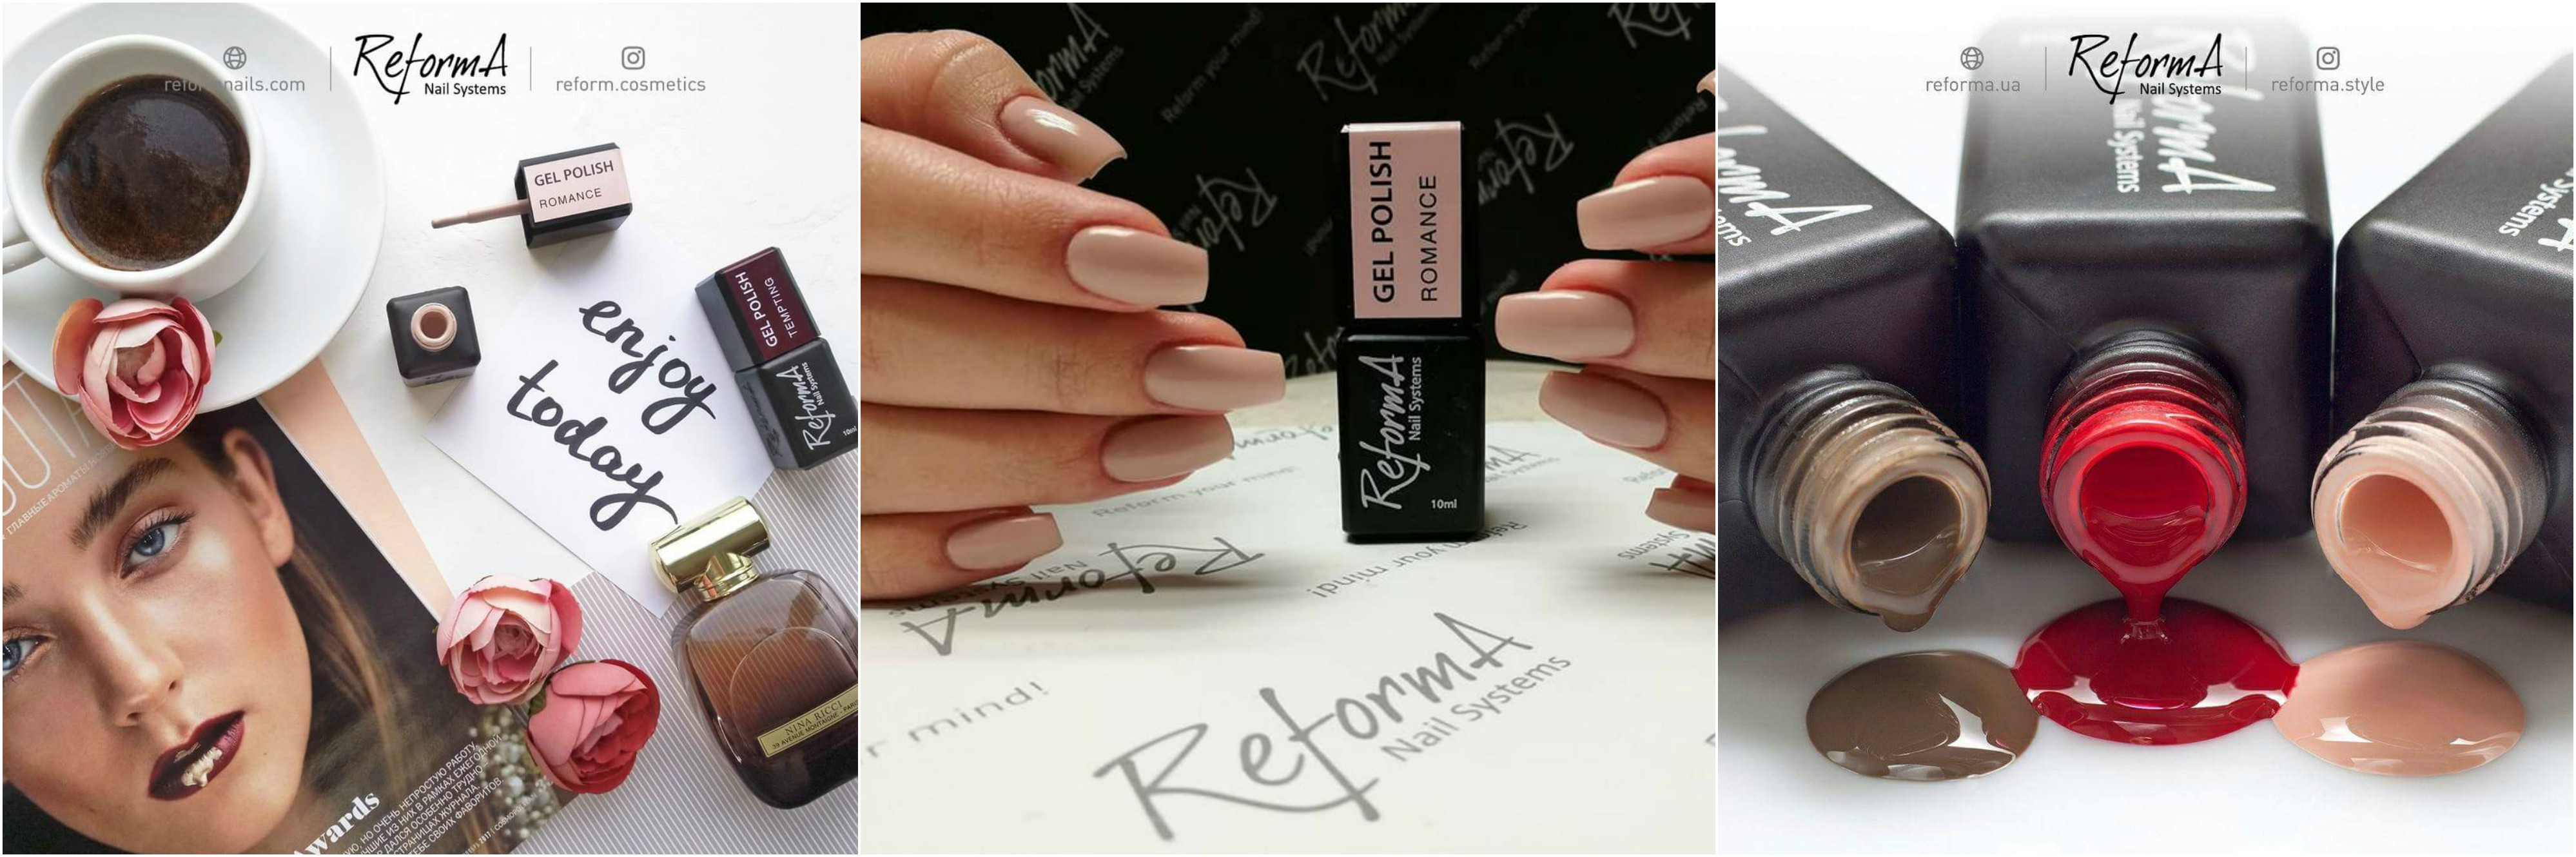 Reforma – enjoy today